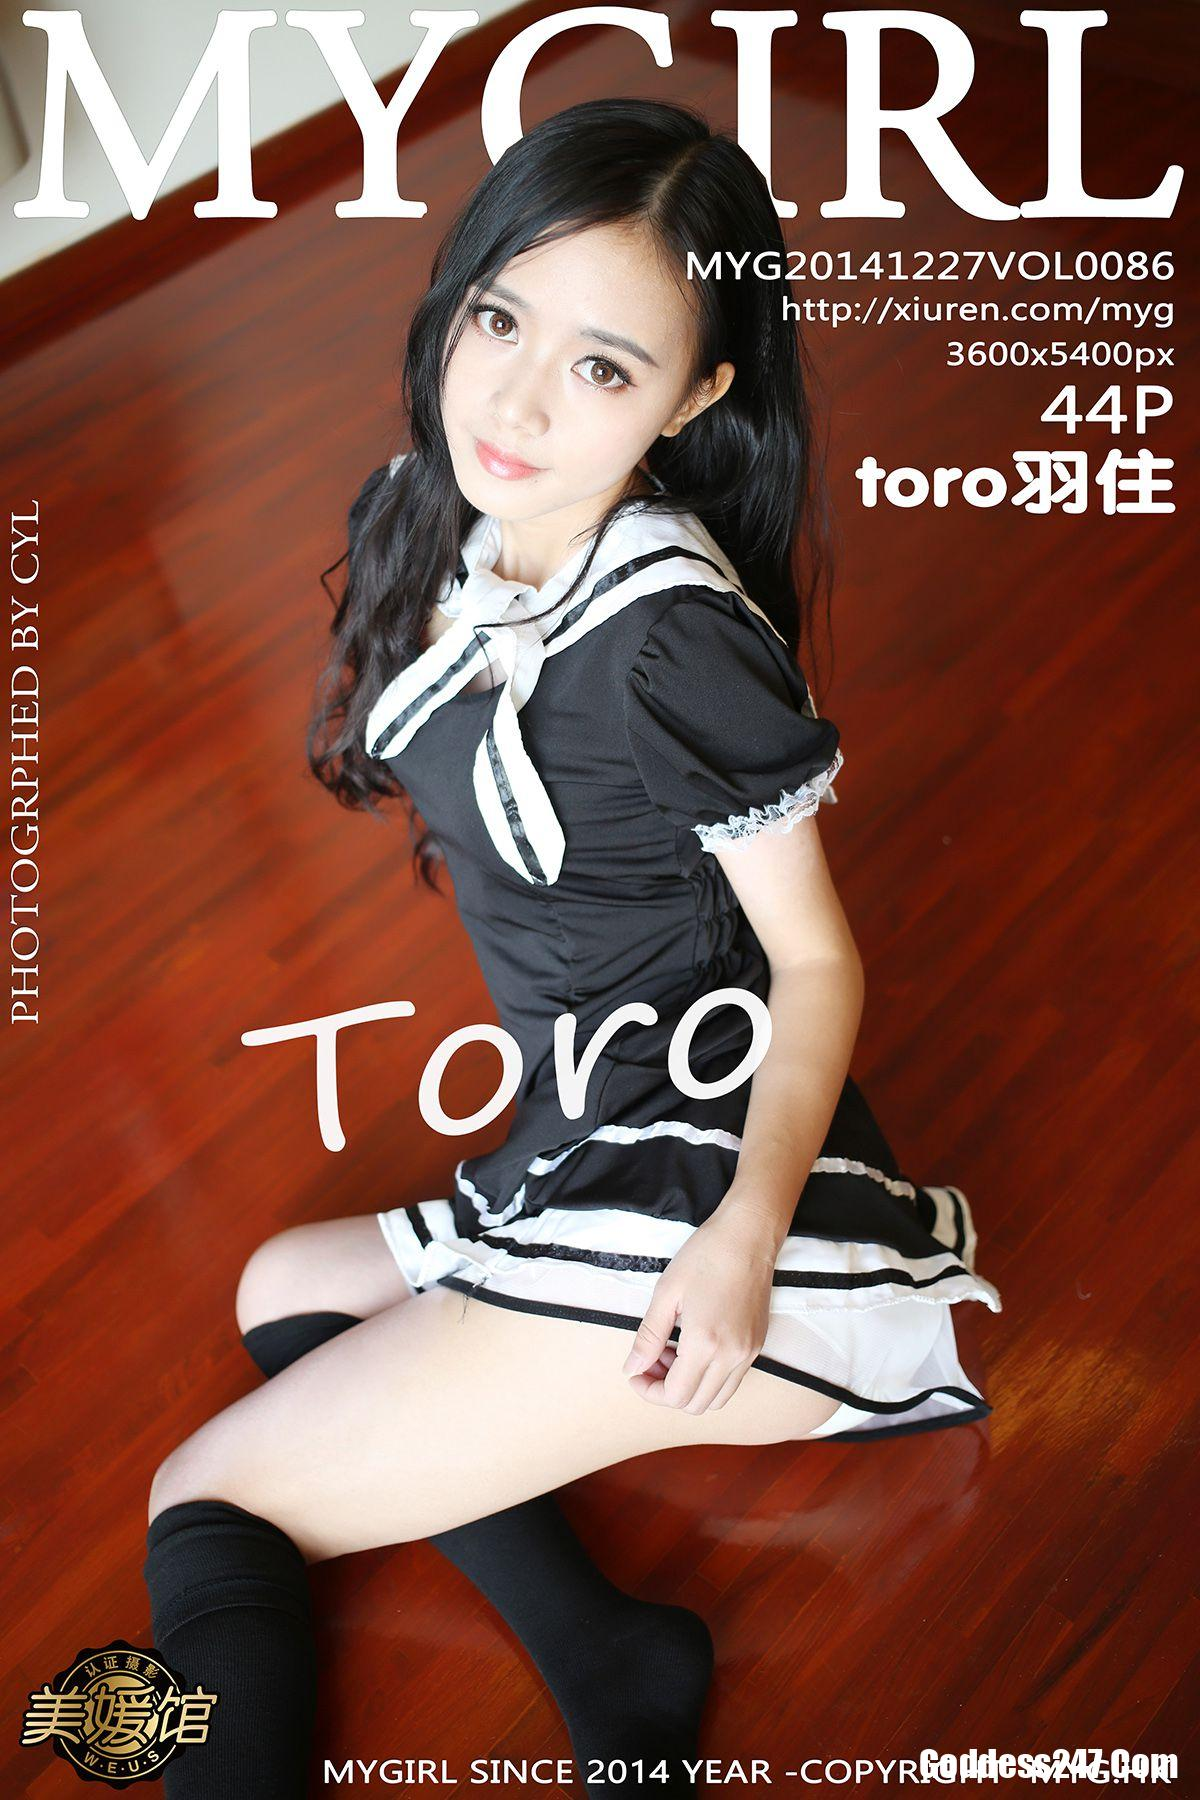 MyGirl Vol.086 toro羽住